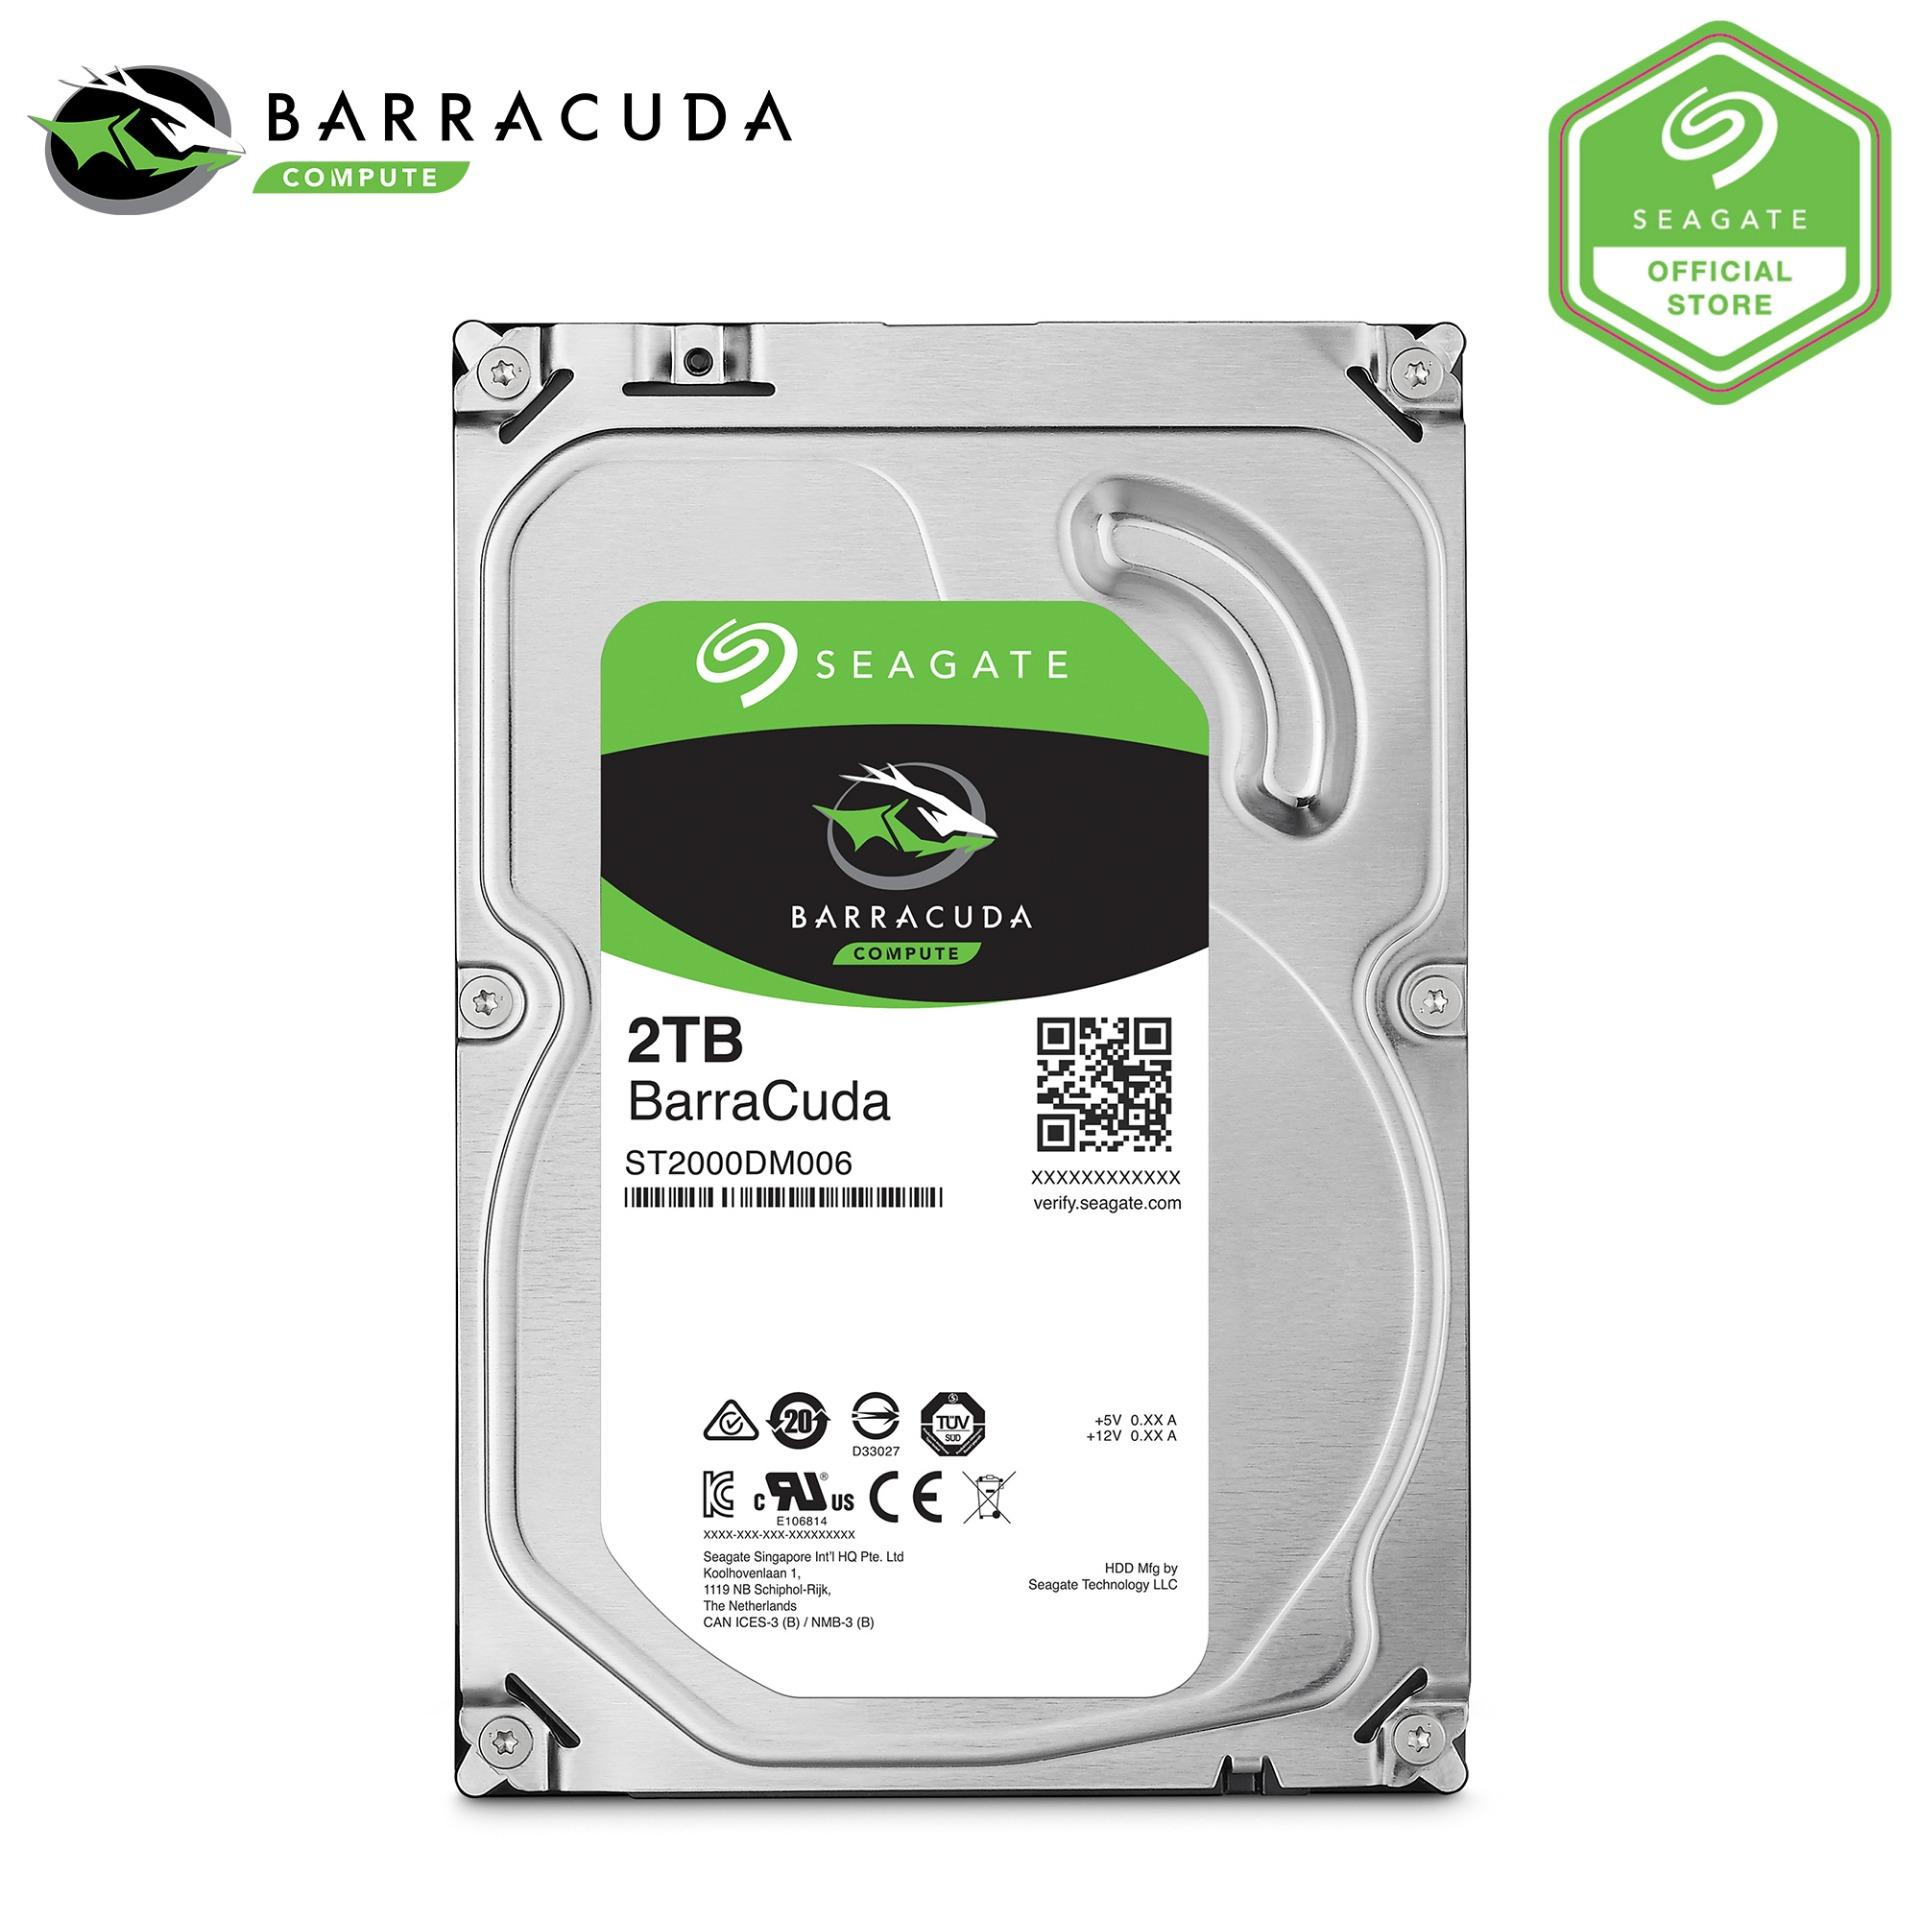 Seagate Barracuda 1tb Hardisk Internal Laptop Sshd 25 Sata 307200rpm Skyhawk Hdd 35inch 4tb Hard Disk Cctv Garansi Resmi 35 2tb Desktop